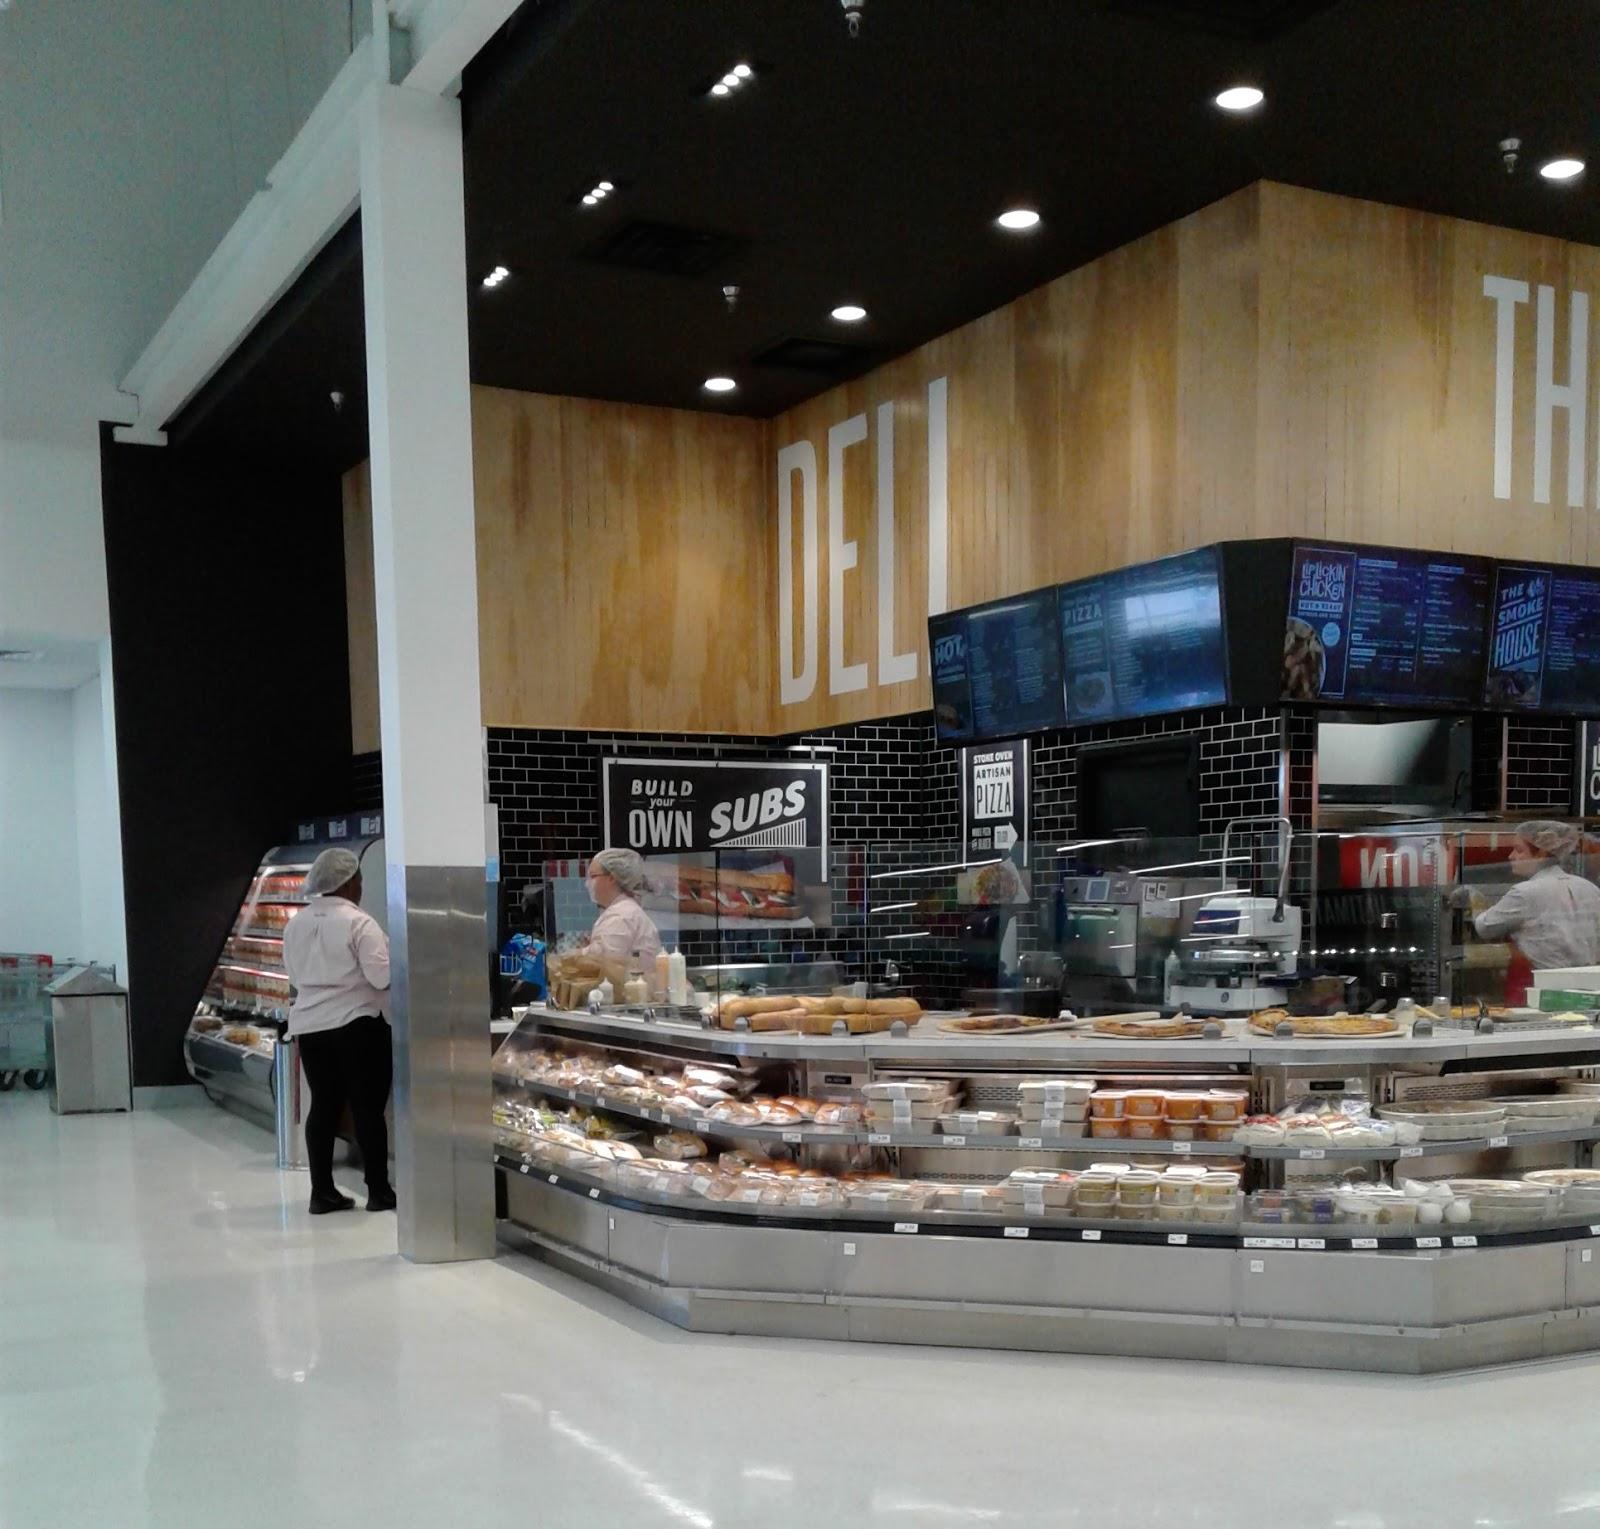 Dixie Kitchen: Albertsons Florida Blog: This Is A Winn-Dixie?